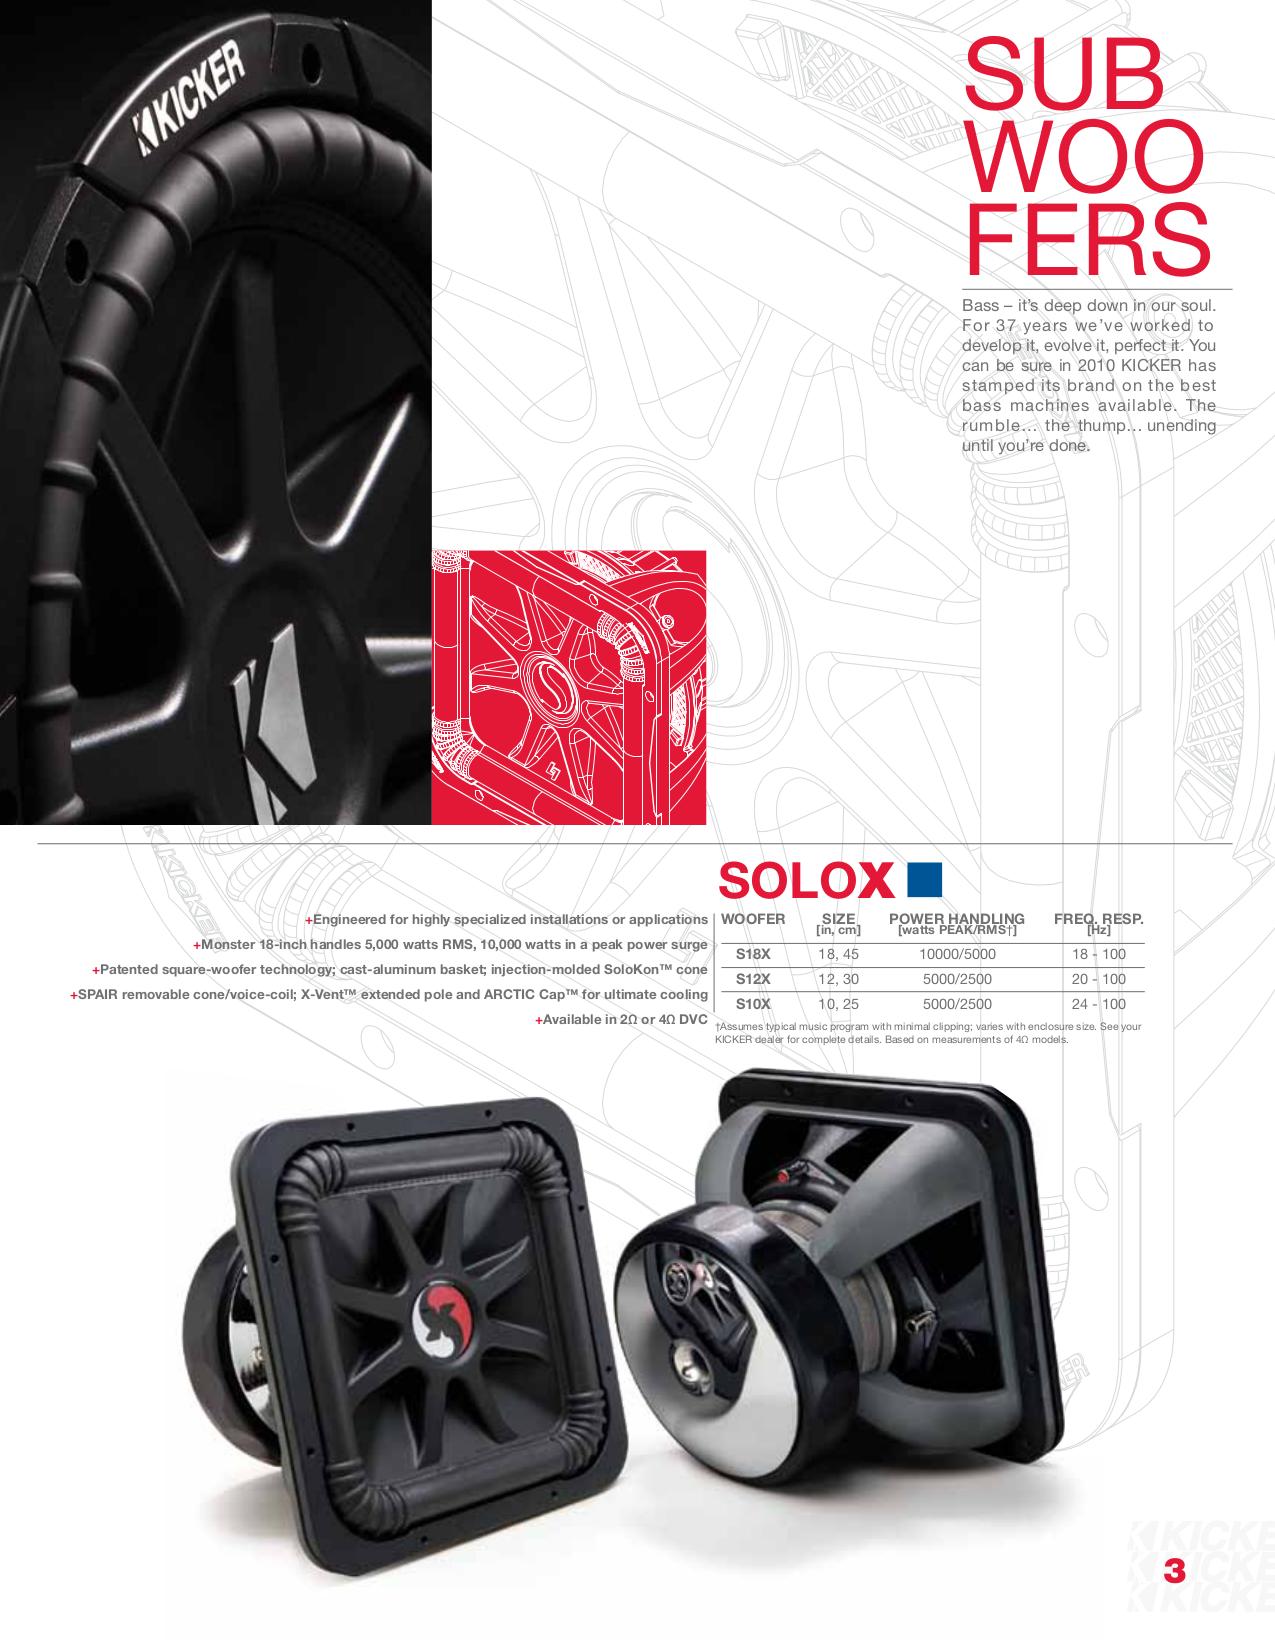 pdf for Kicker Subwoofer Solo-Baric L5 TS10L5 manual